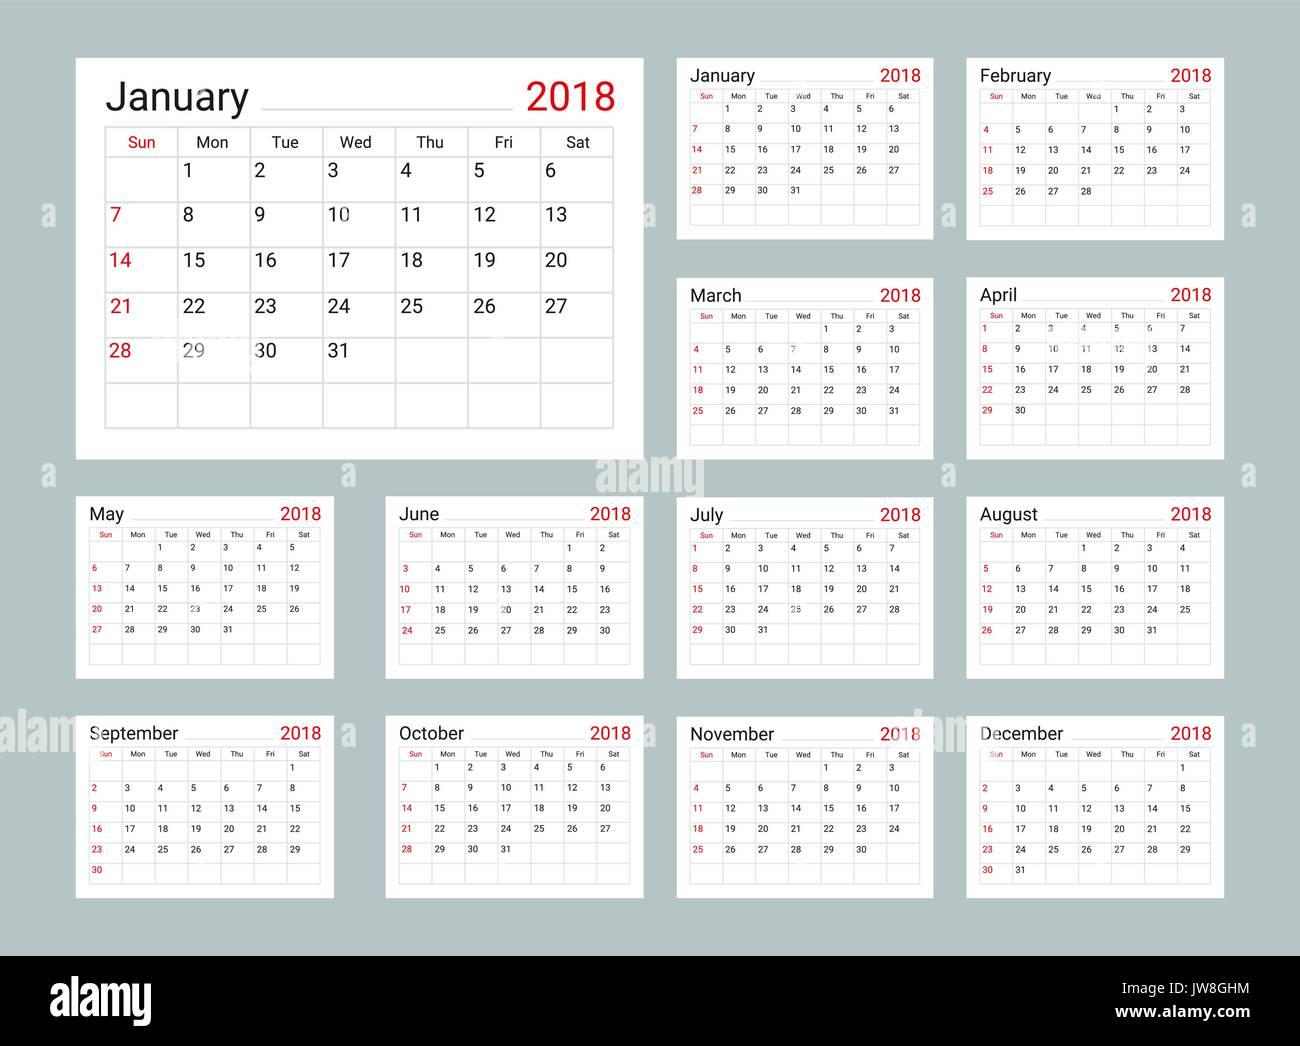 calendar 2018 daily planner template stock vector art illustration